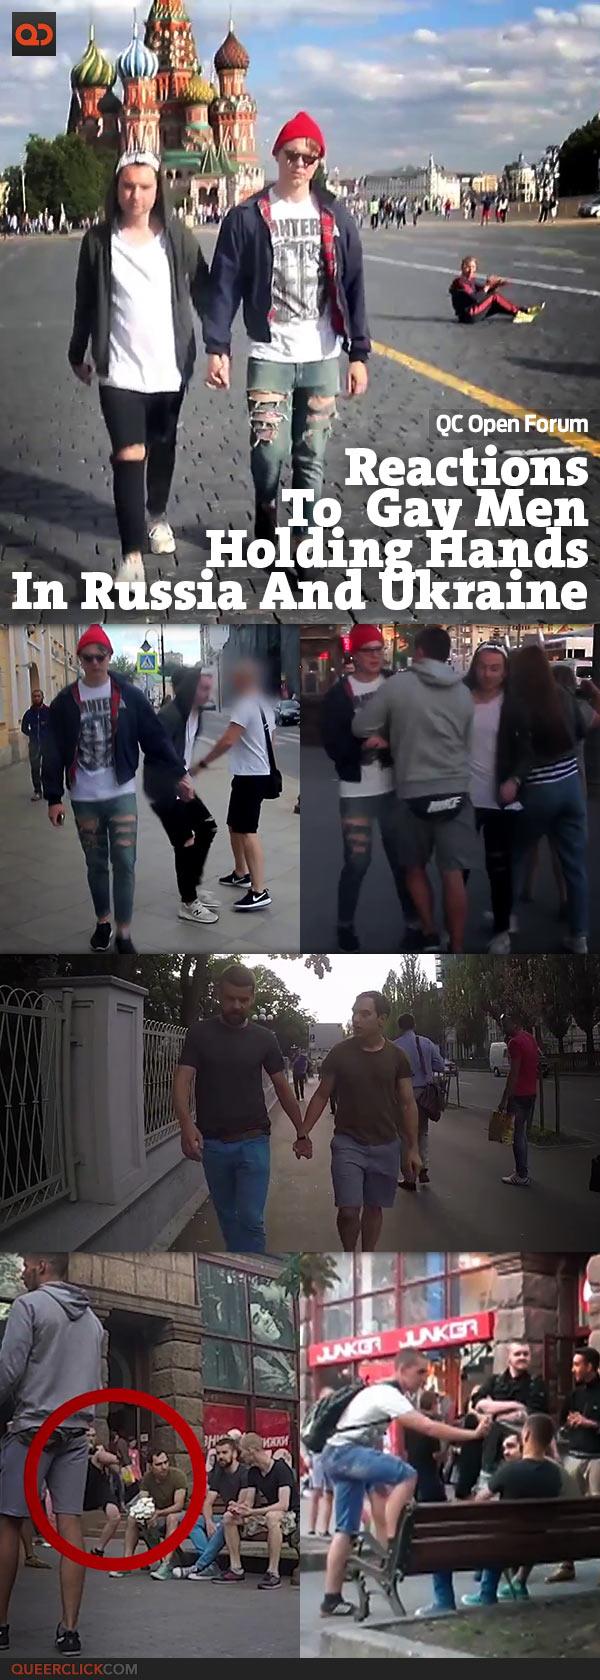 QC Open Forum: Reactions To Gay Men Holding Hands In Russia And Ukraine